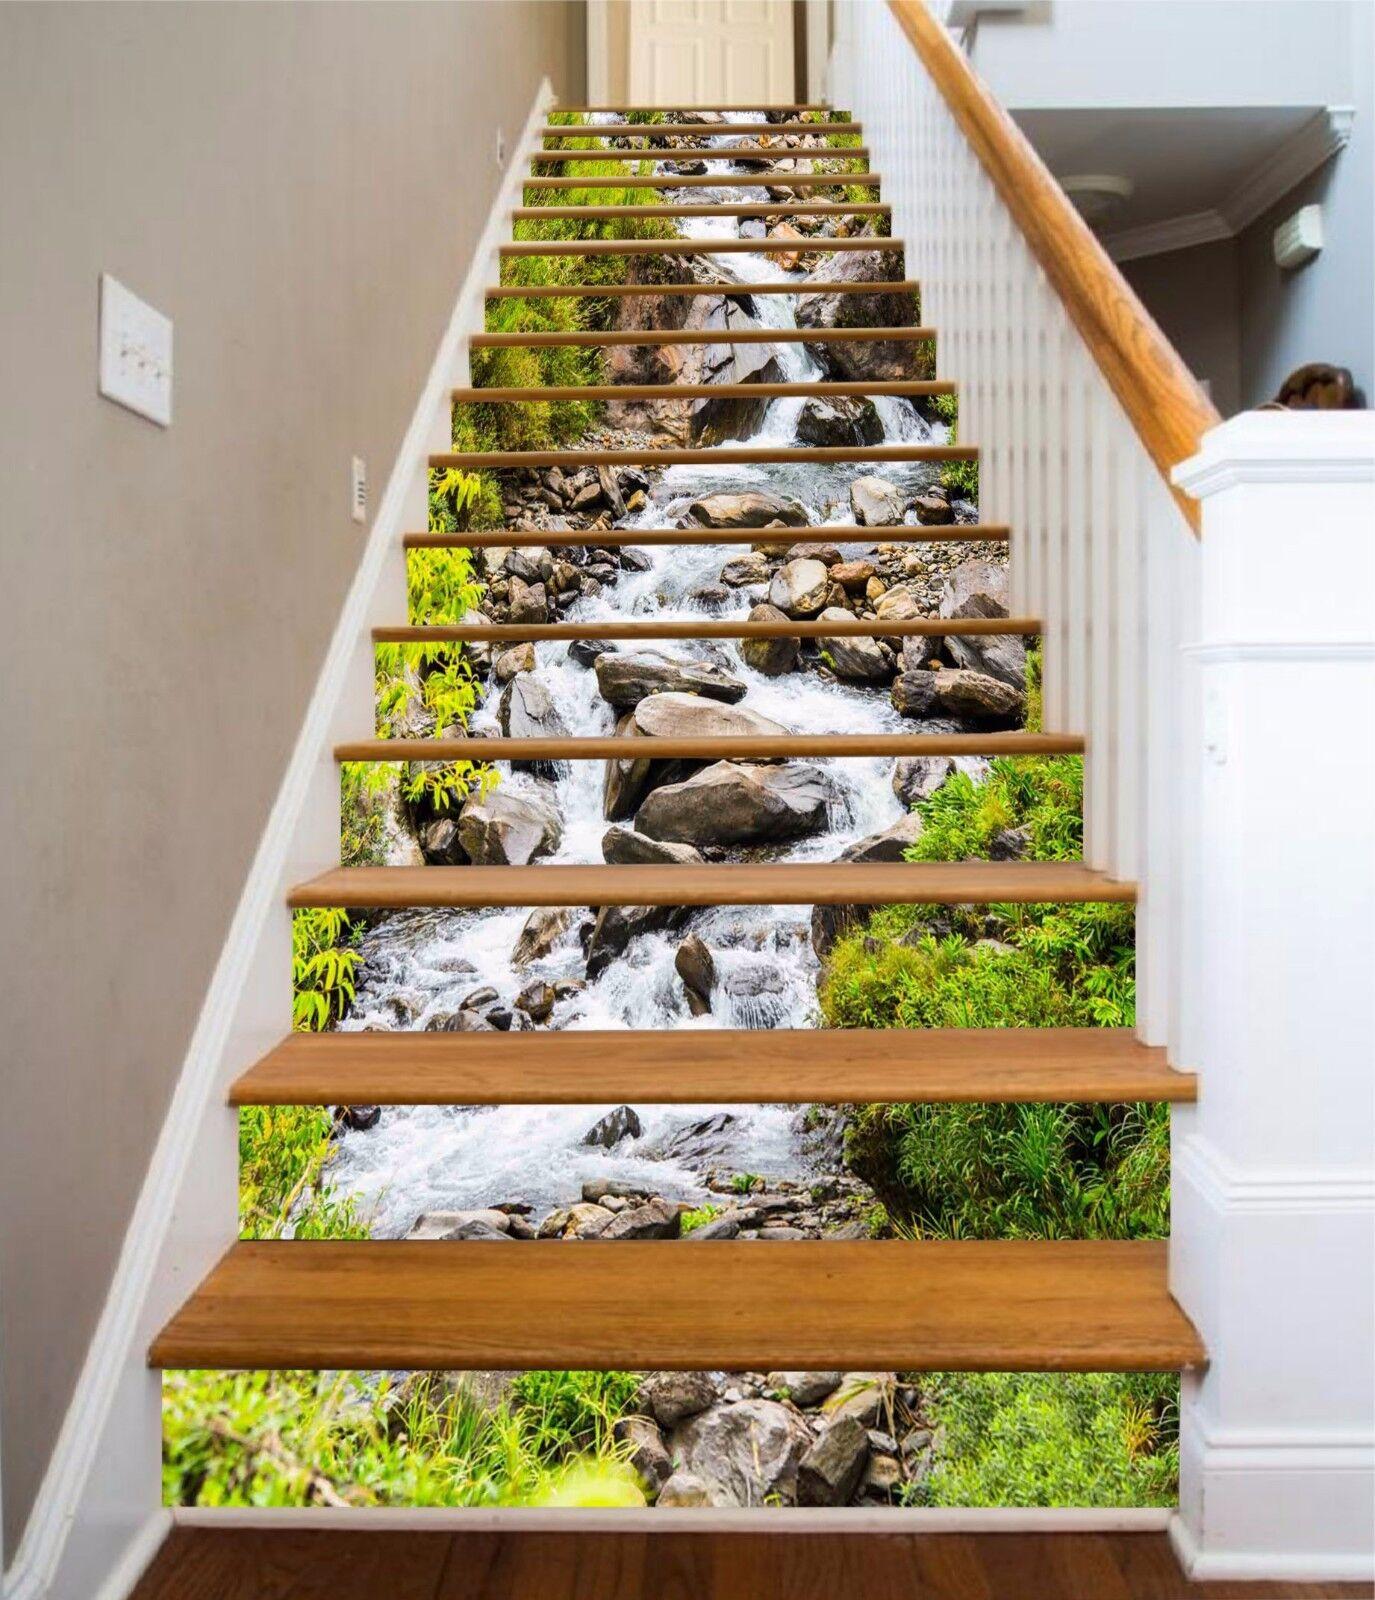 3D Brook Stone 538 Stair Risers Decoration Photo Mural Vinyl Decal Wallpaper AU